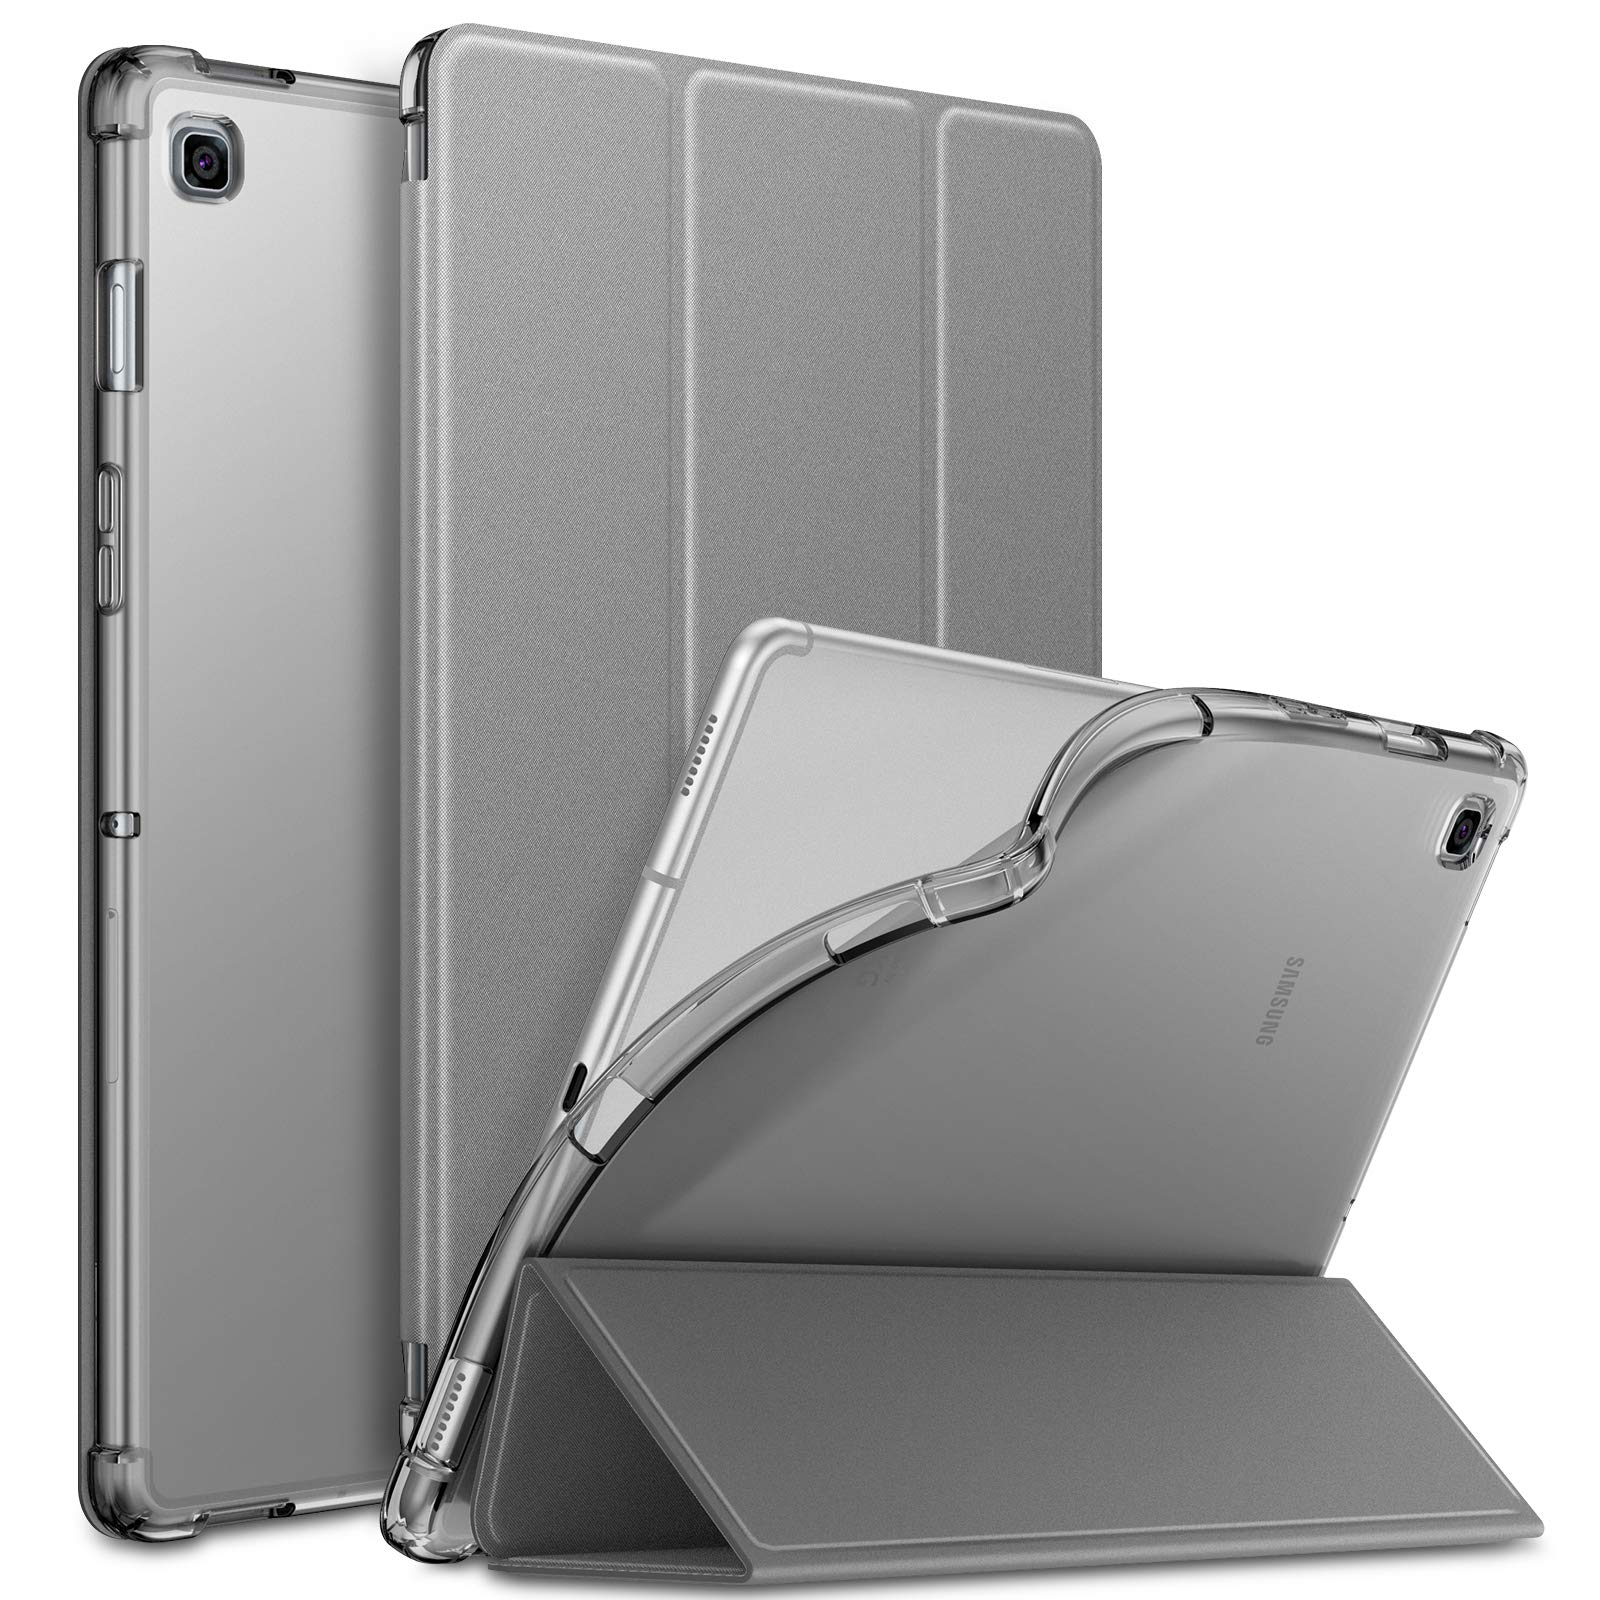 Funda Samsung Galaxy Tab S5e Infiland [7scl3tbw]